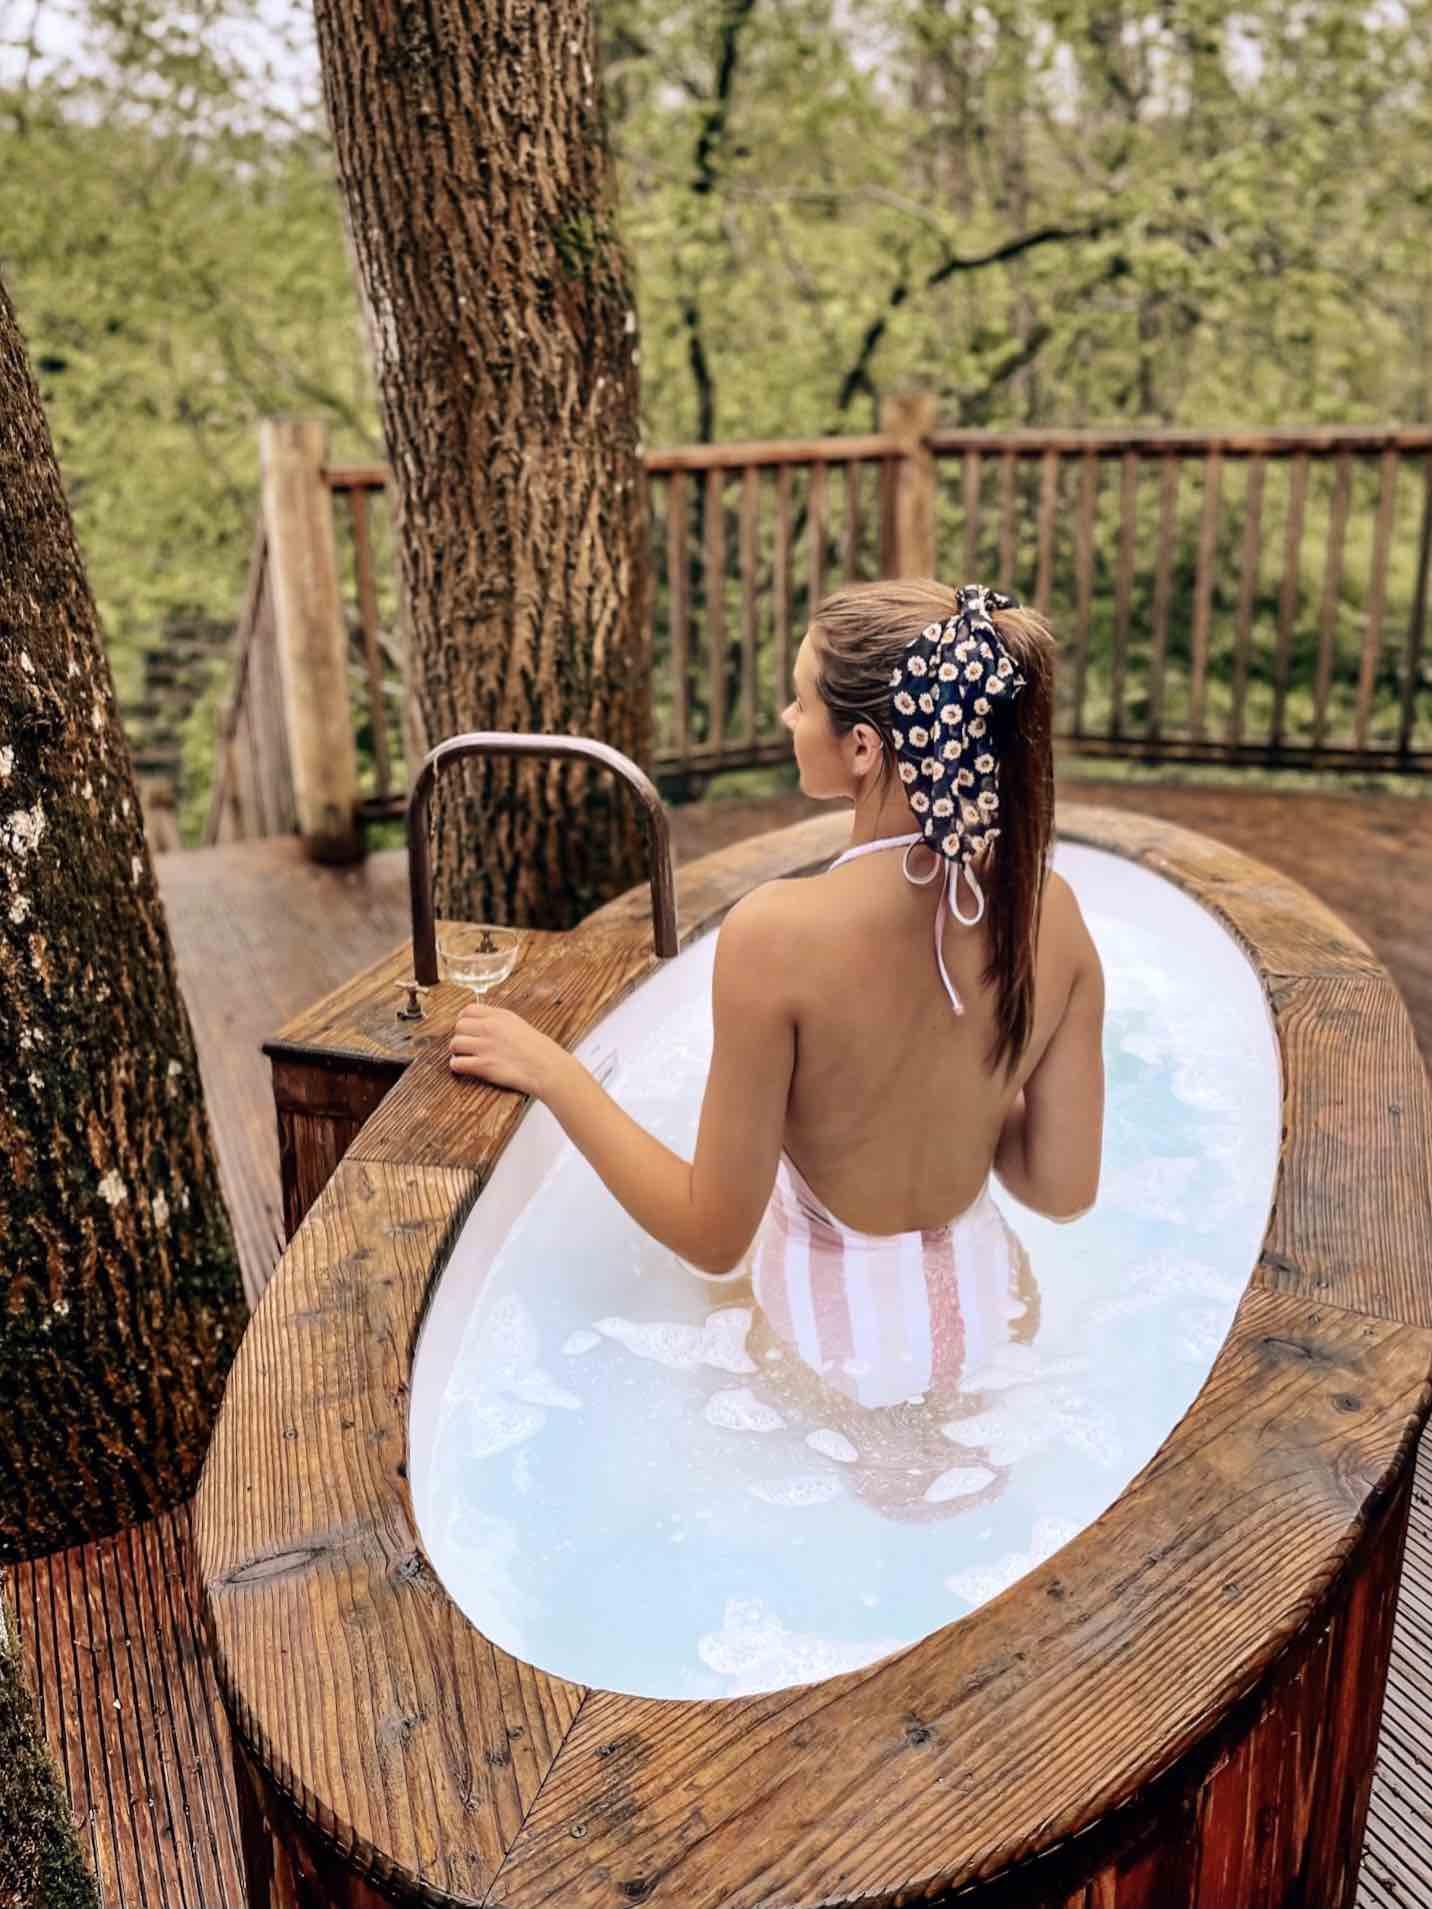 Bower Treehouse Outdoor Bath